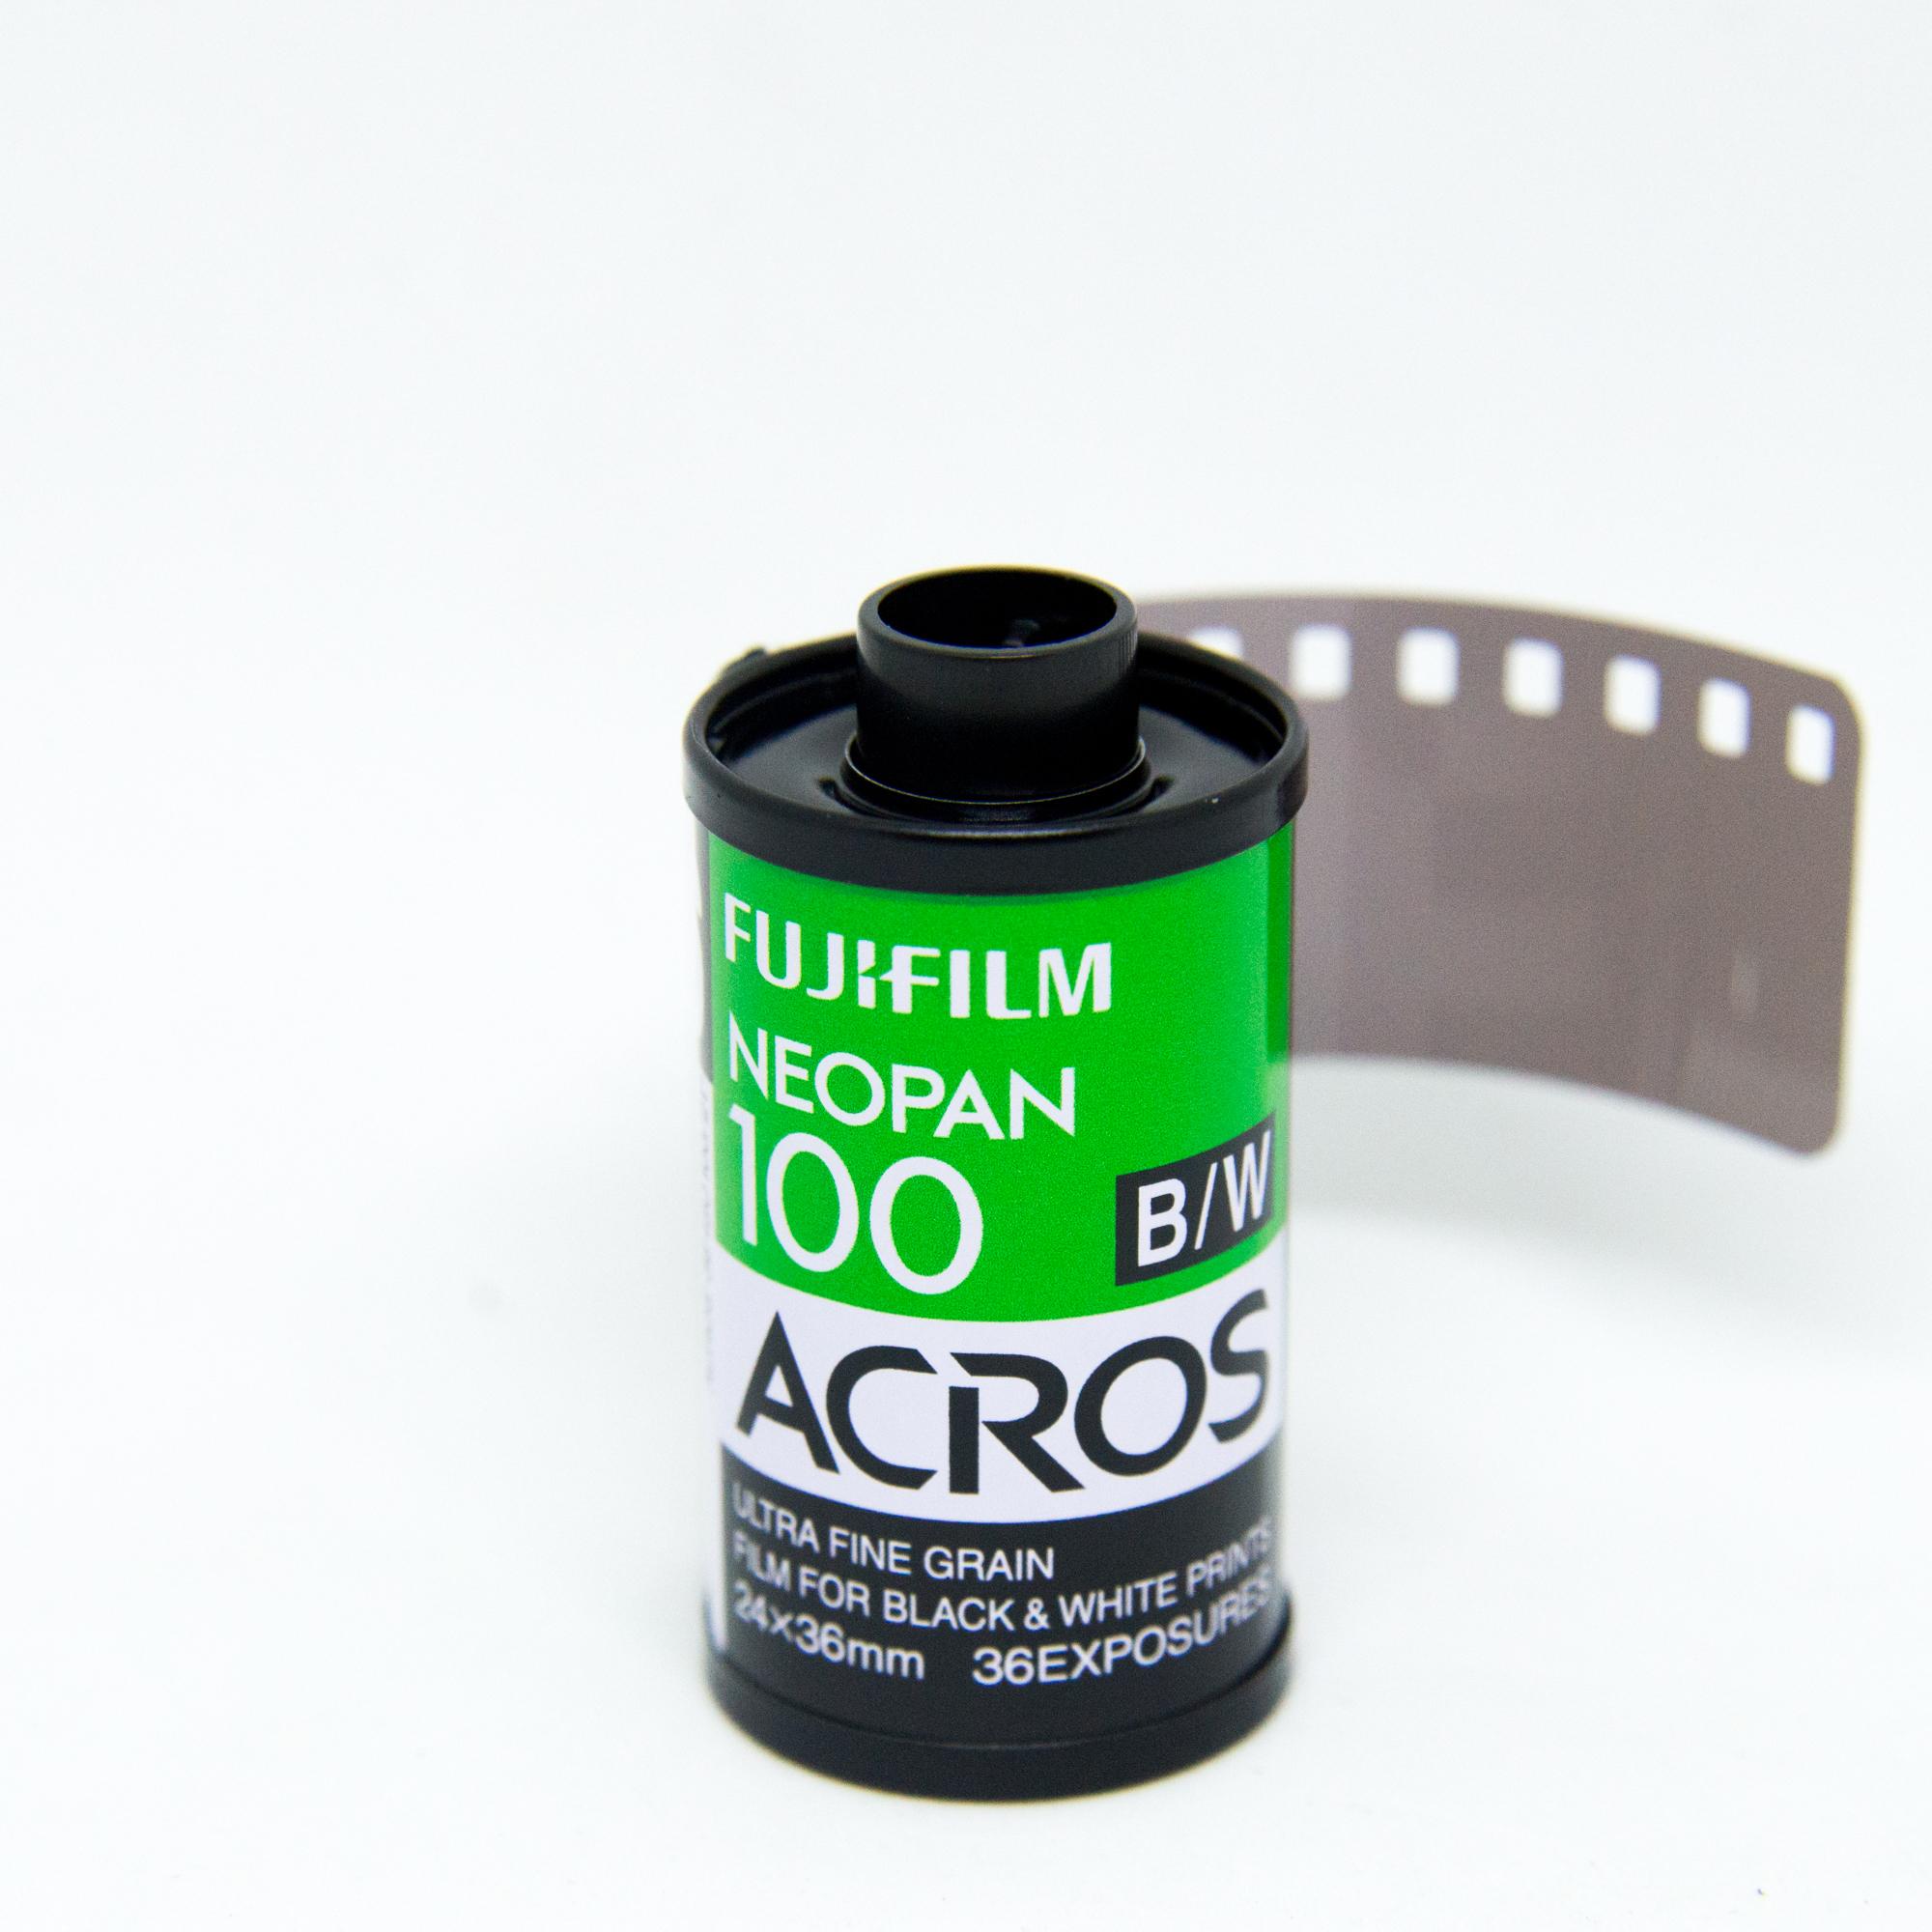 Фотопленка Fujifilm Neopan Acros 100/135-36